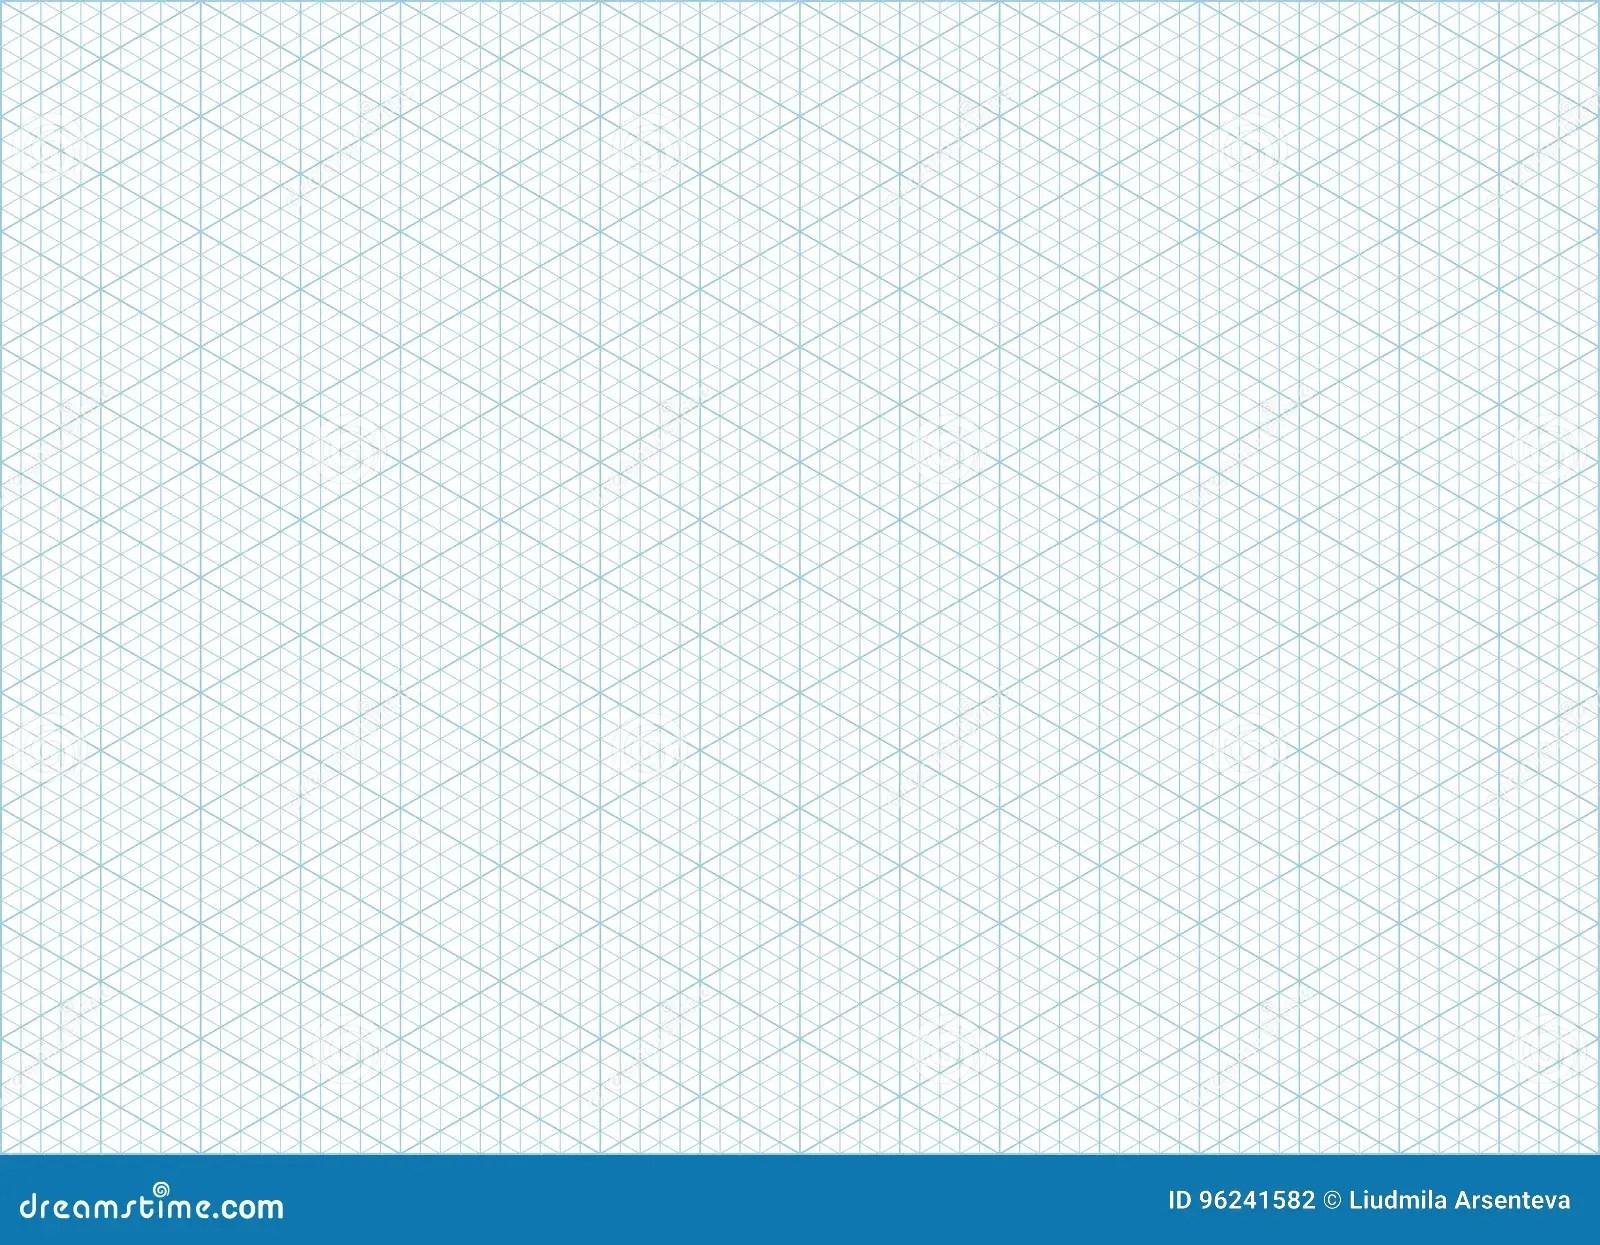 11x17 graph paper printable